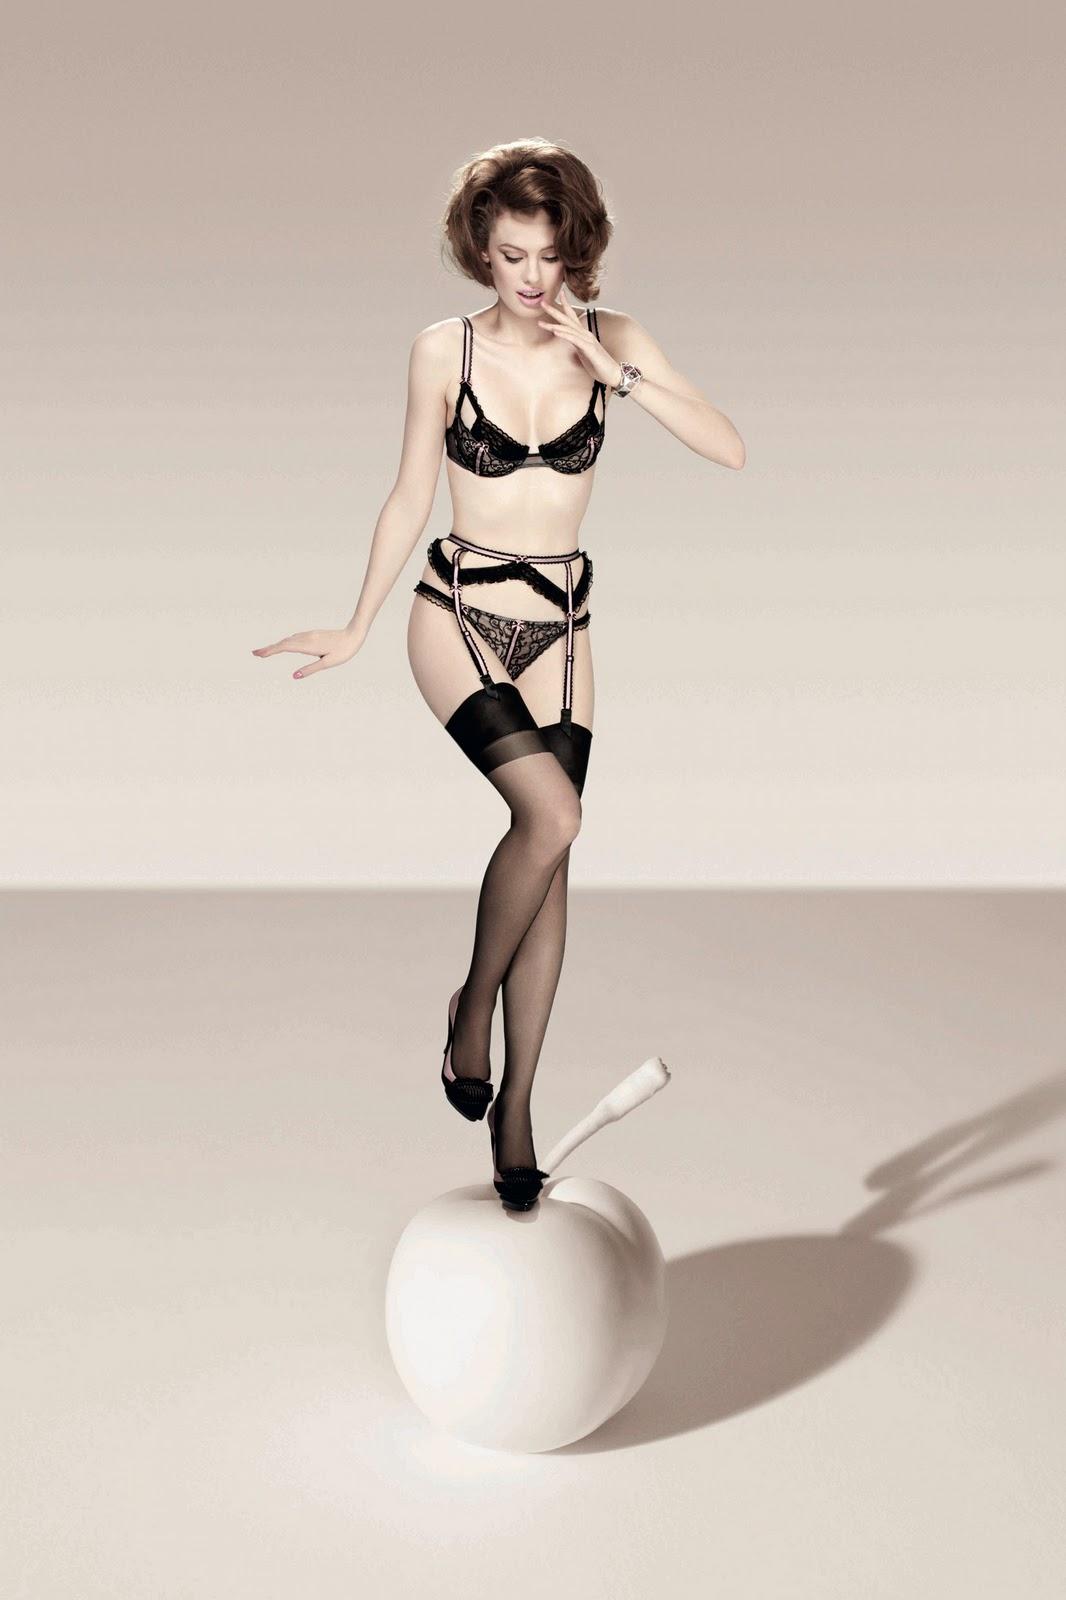 alex jones lingerie chantal thomass. Black Bedroom Furniture Sets. Home Design Ideas